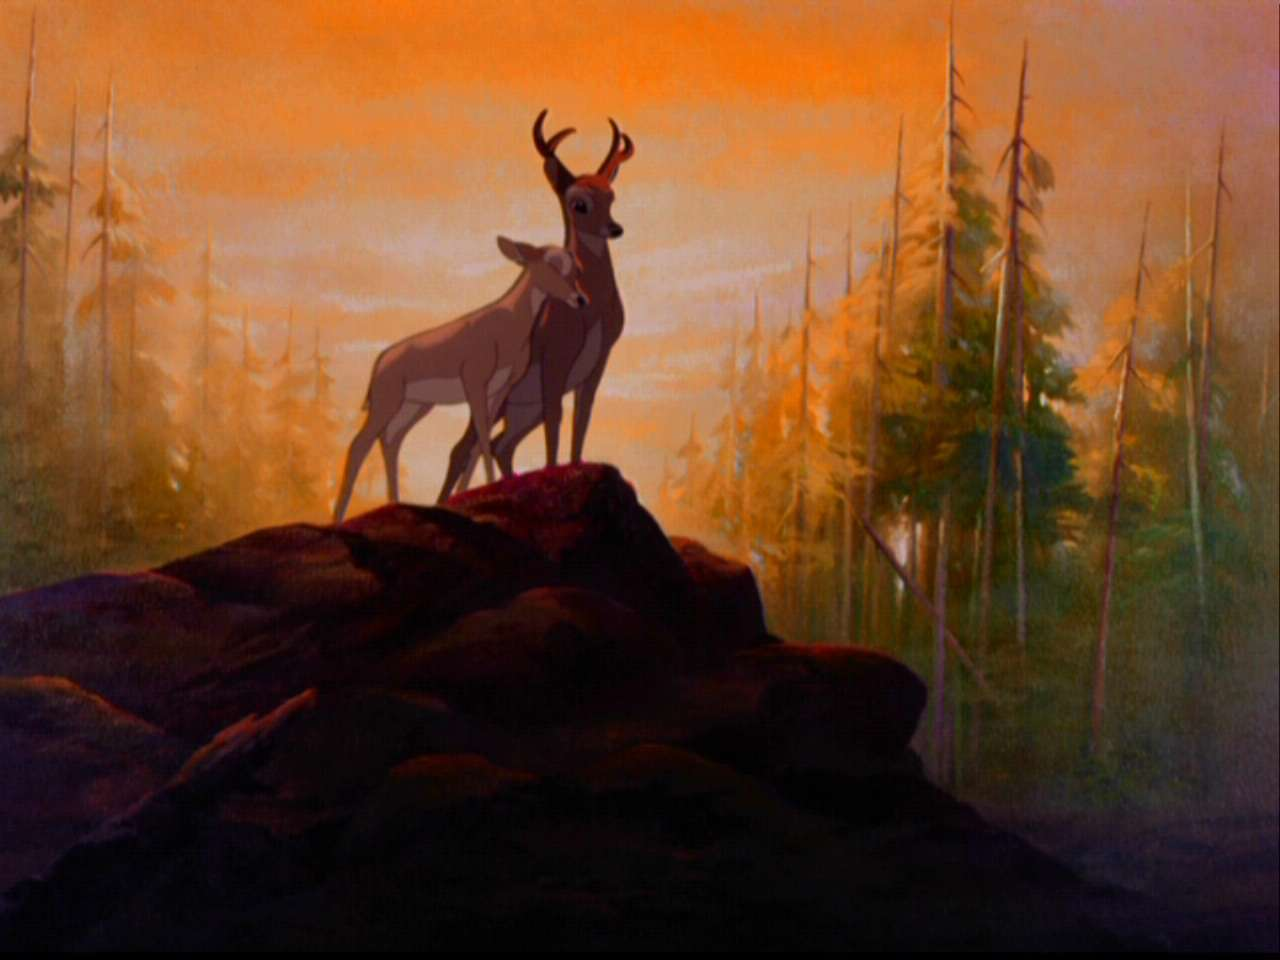 Bambi-bambi-5797378-1280-960.jpg